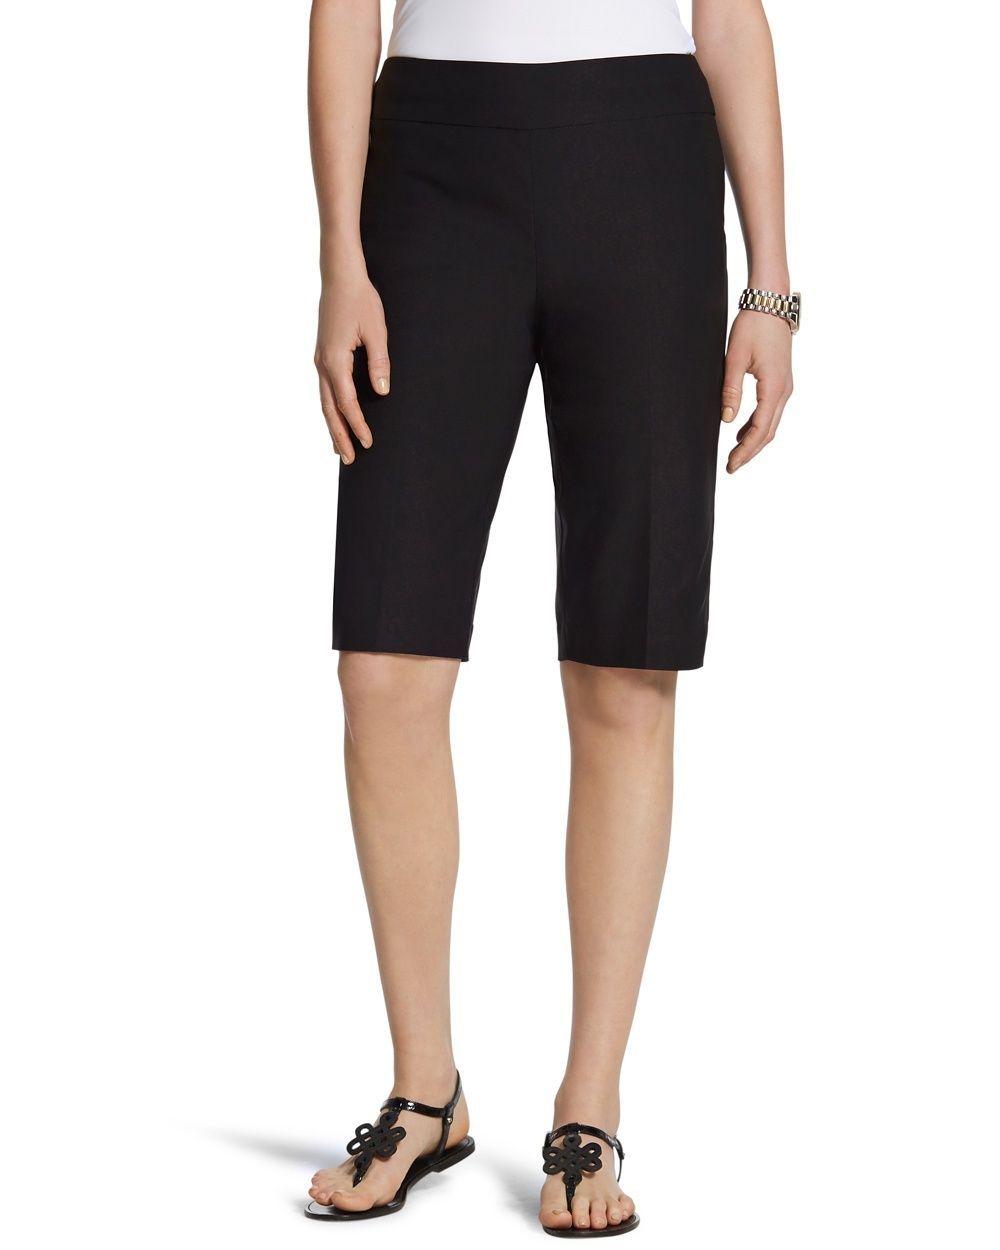 Brigitte shorts in black 11 inch inseam shorts clothes